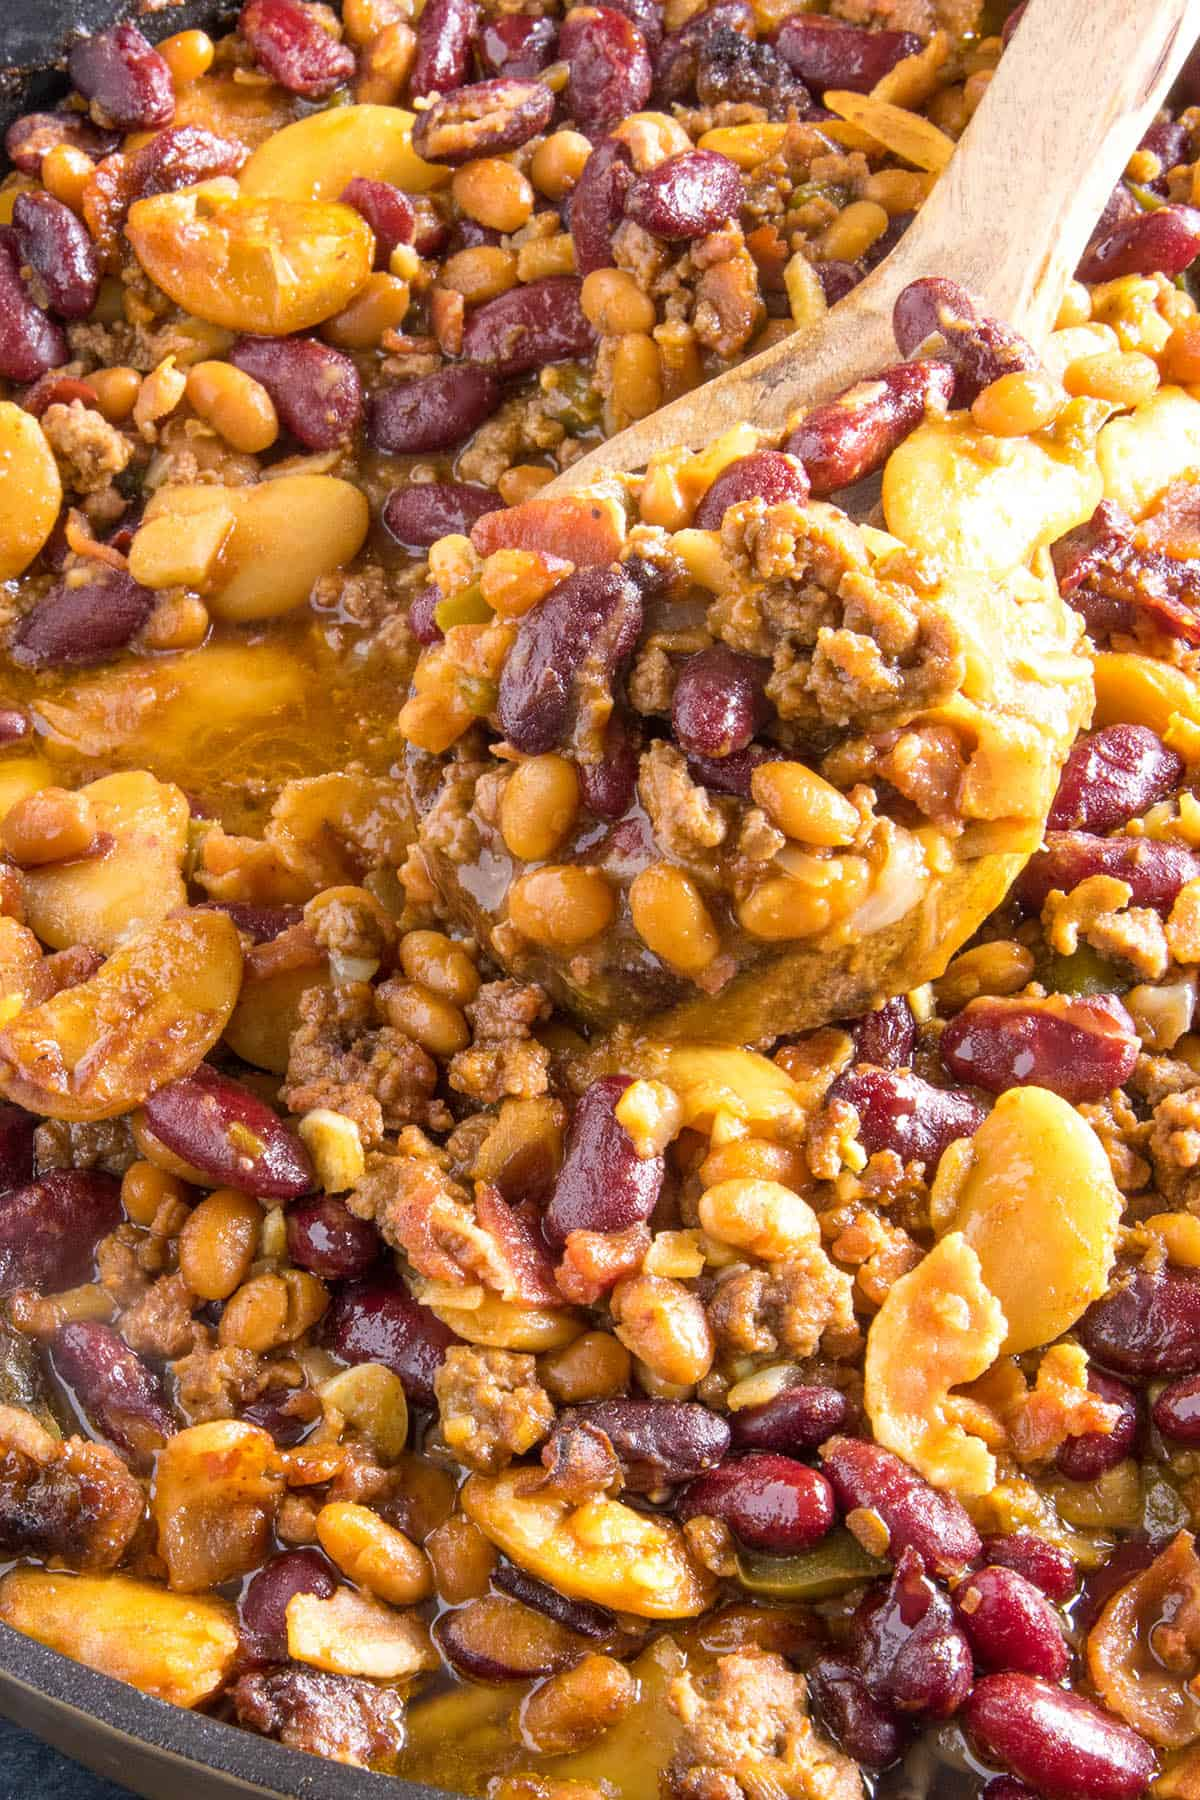 Cowboy Beans on a spoon